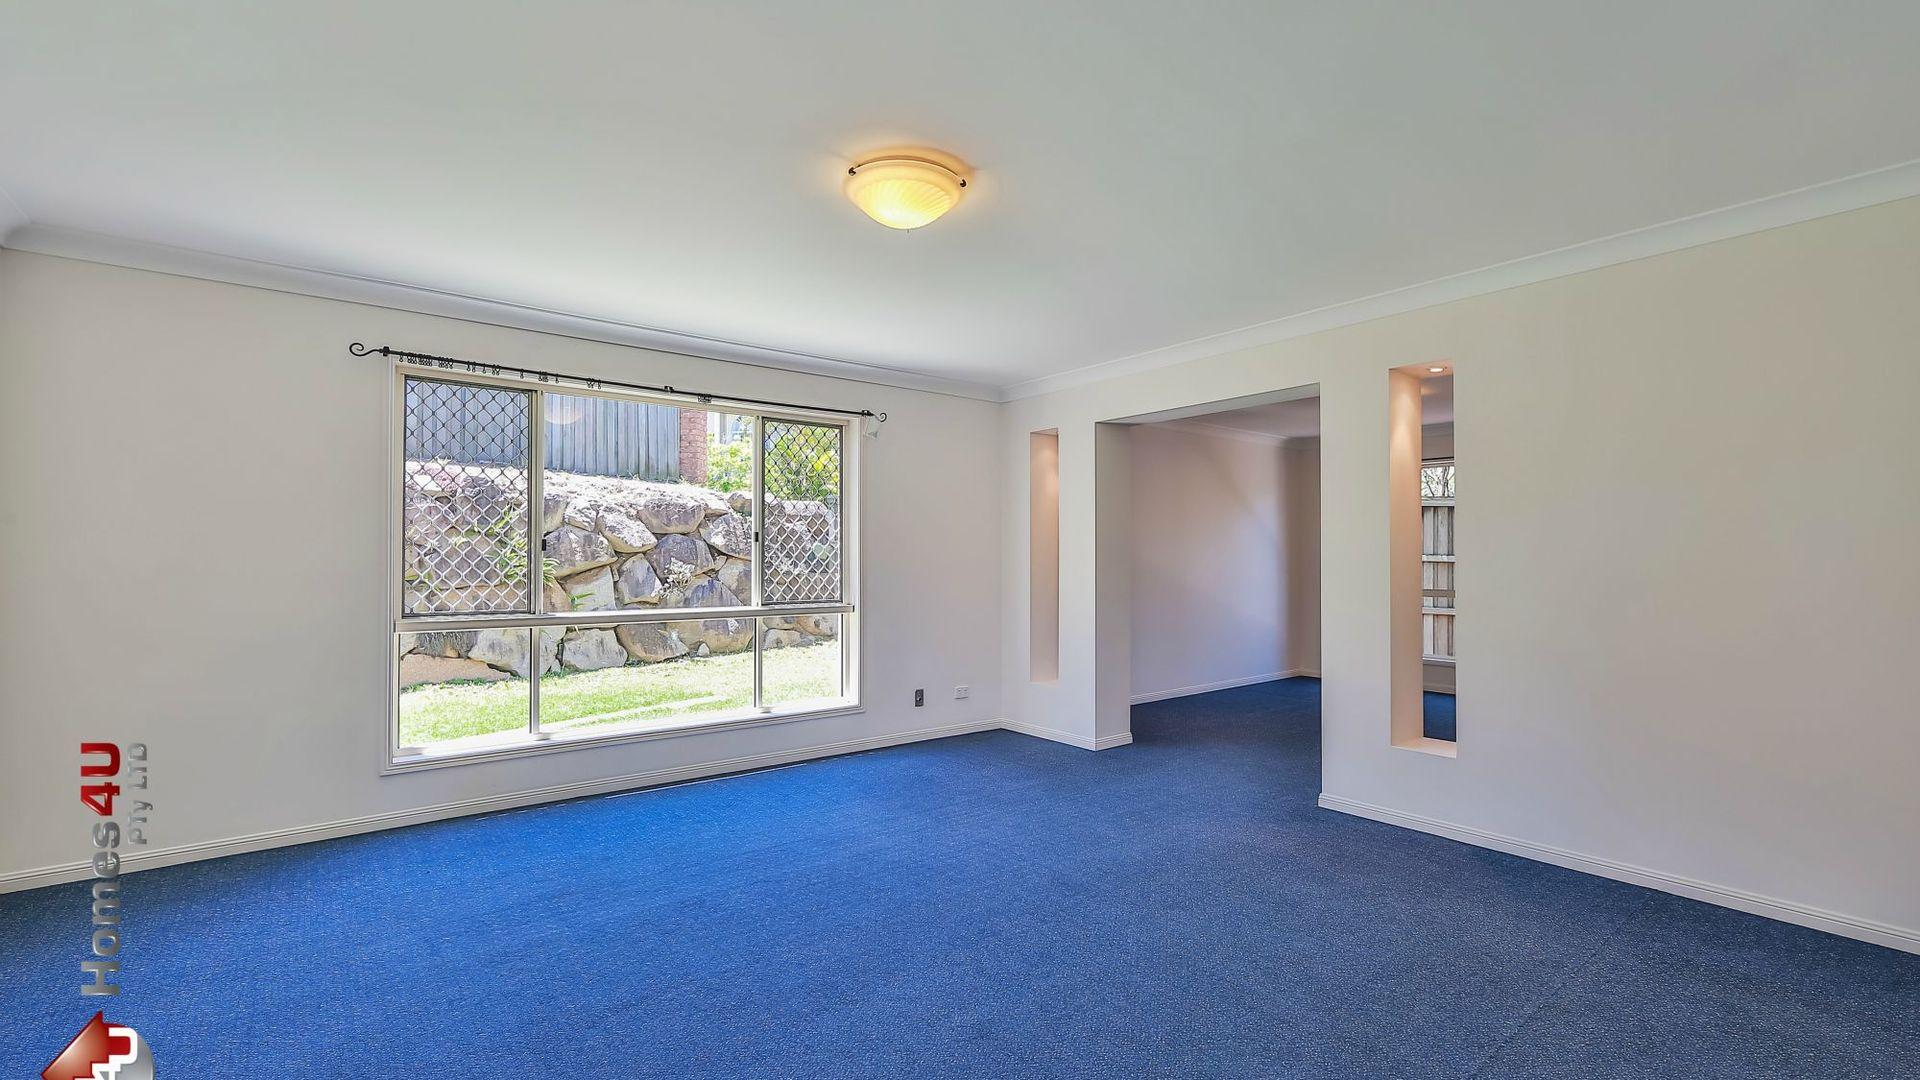 56 Matthau Place, Mcdowall QLD 4053, Image 1